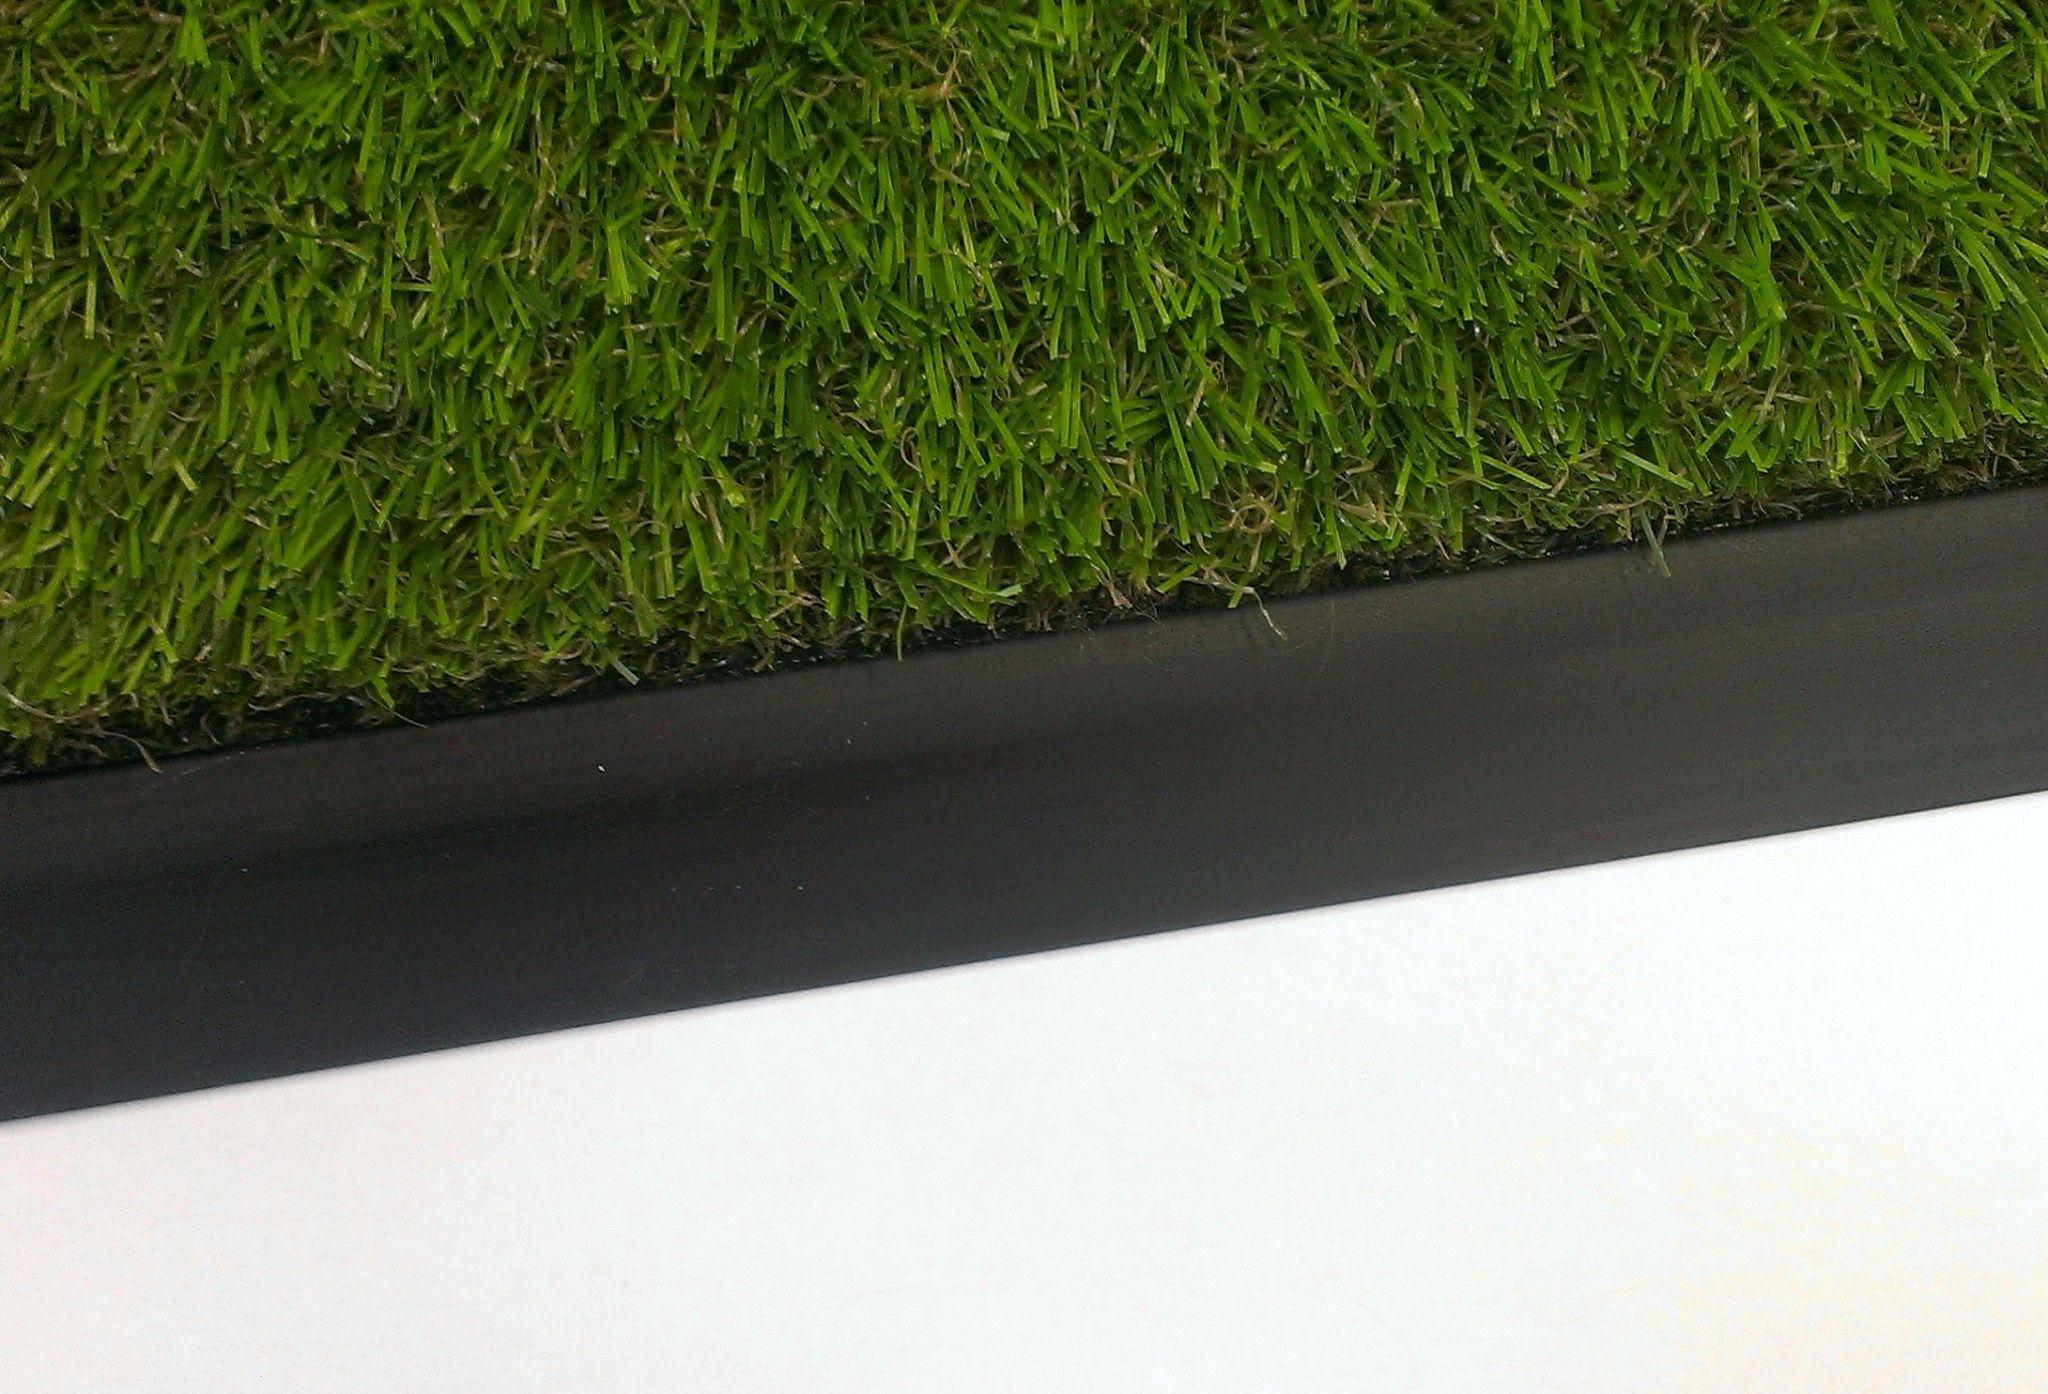 Artificial Grass Edge Trim 10mm